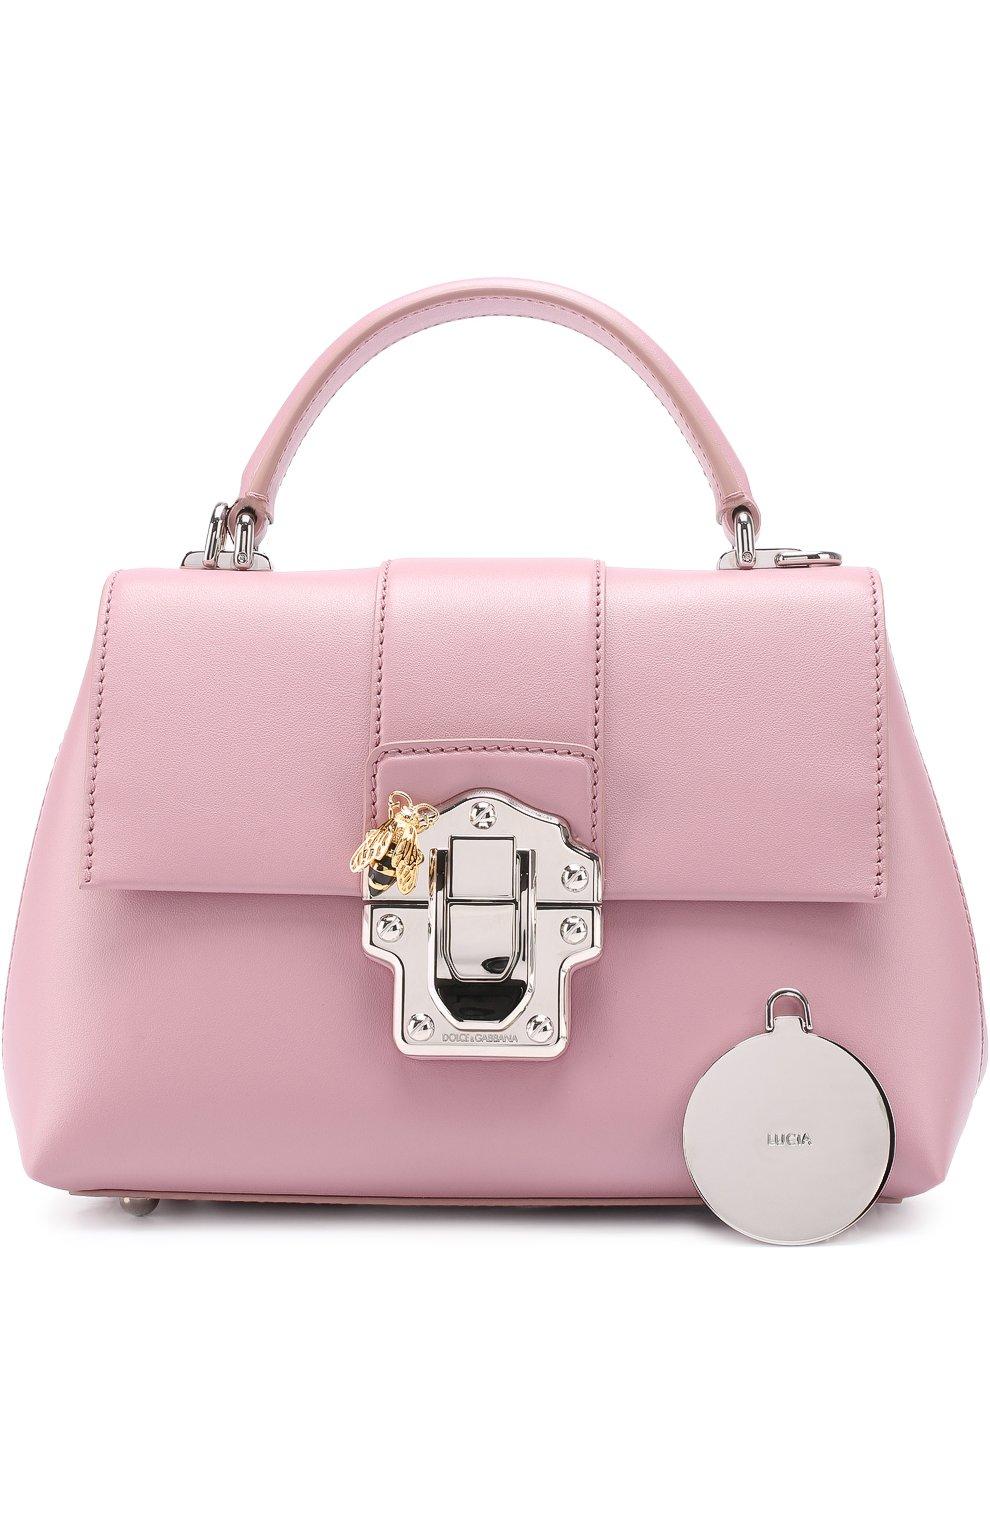 Сумка Lucia small Dolce & Gabbana розовая цвета   Фото №6